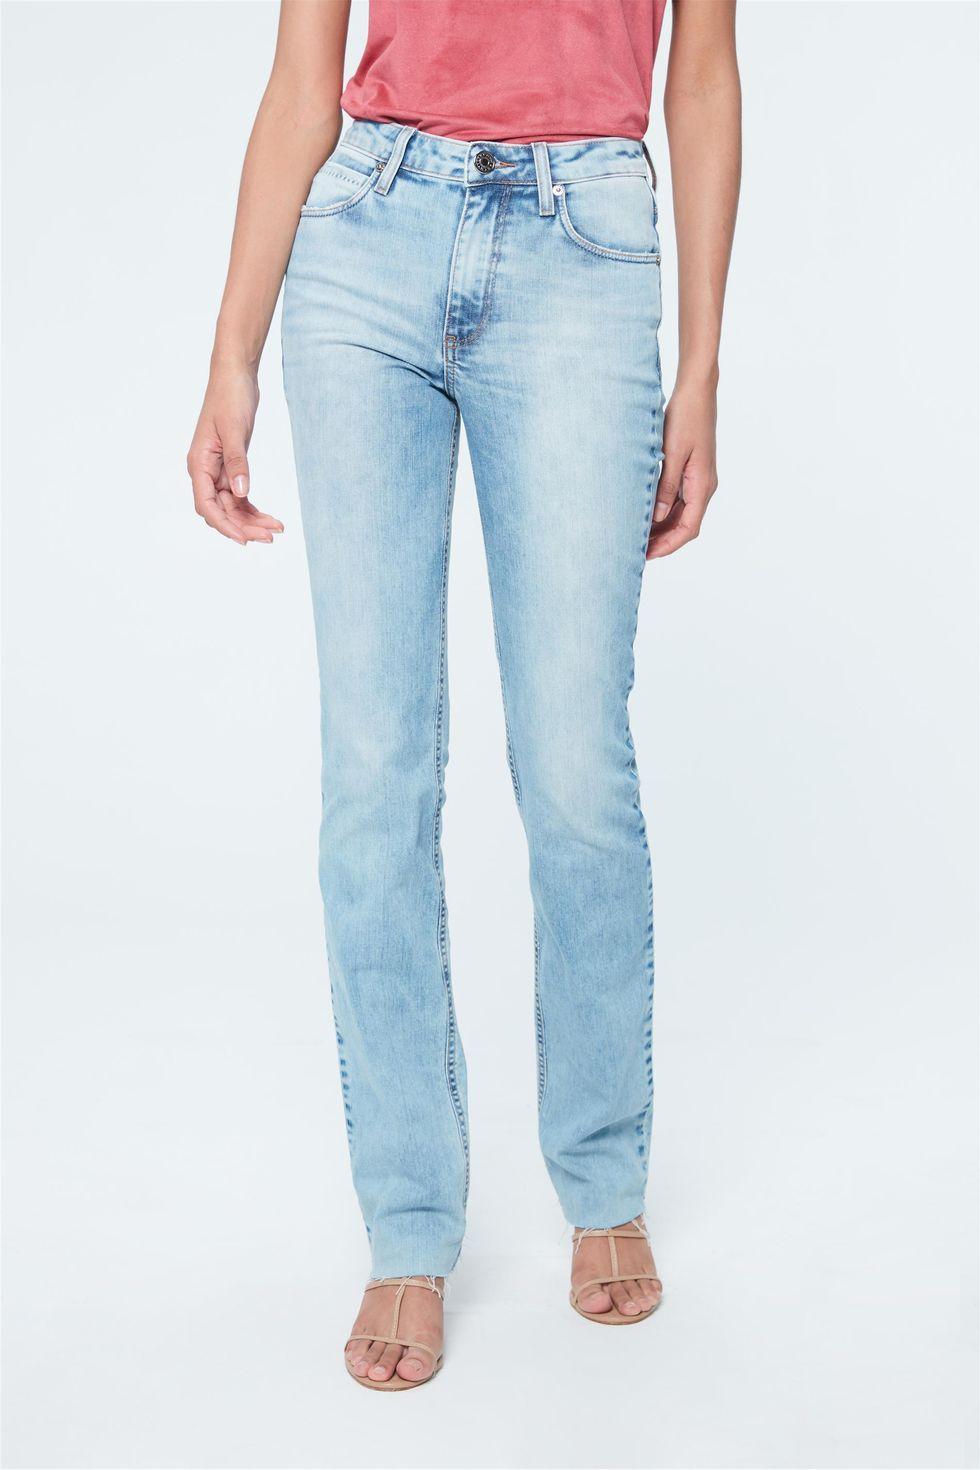 Calca-Jeans-Azul-Claro-Reta-Cintura-Alta-Frente--